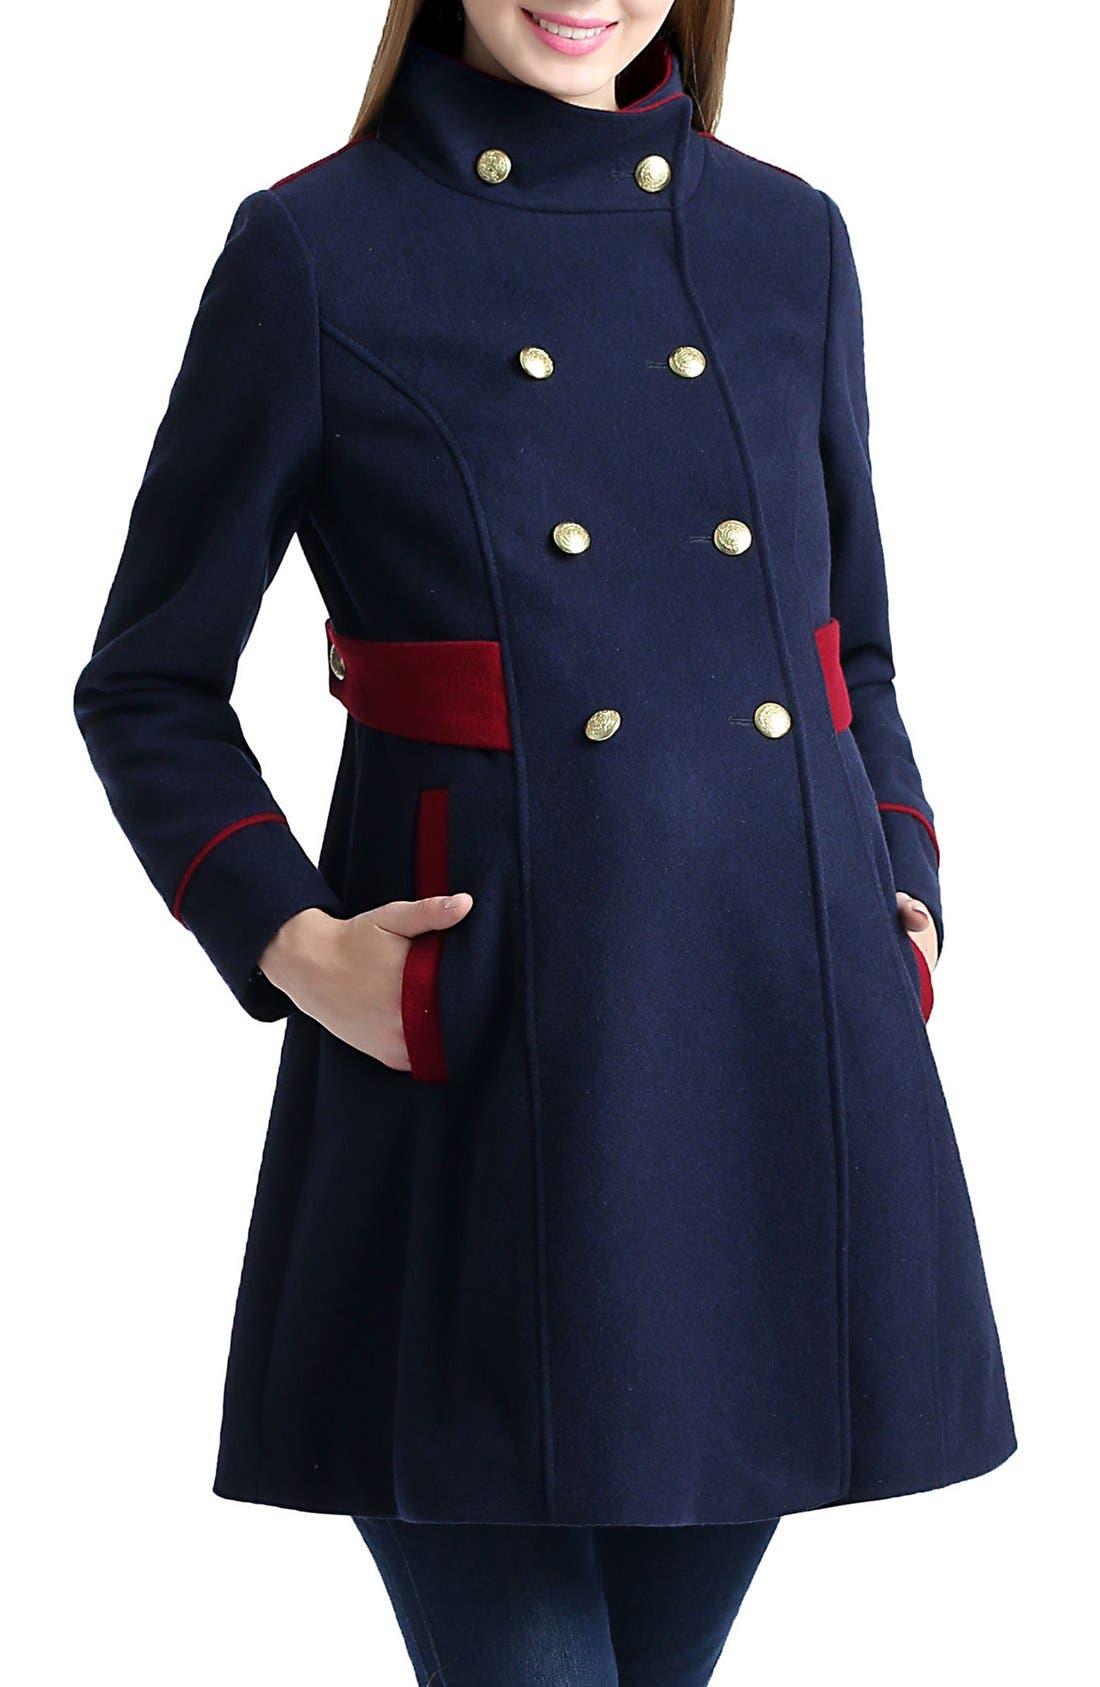 Nom 'Pan' Military Maternity Pea Coat,                             Alternate thumbnail 3, color,                             NAVY